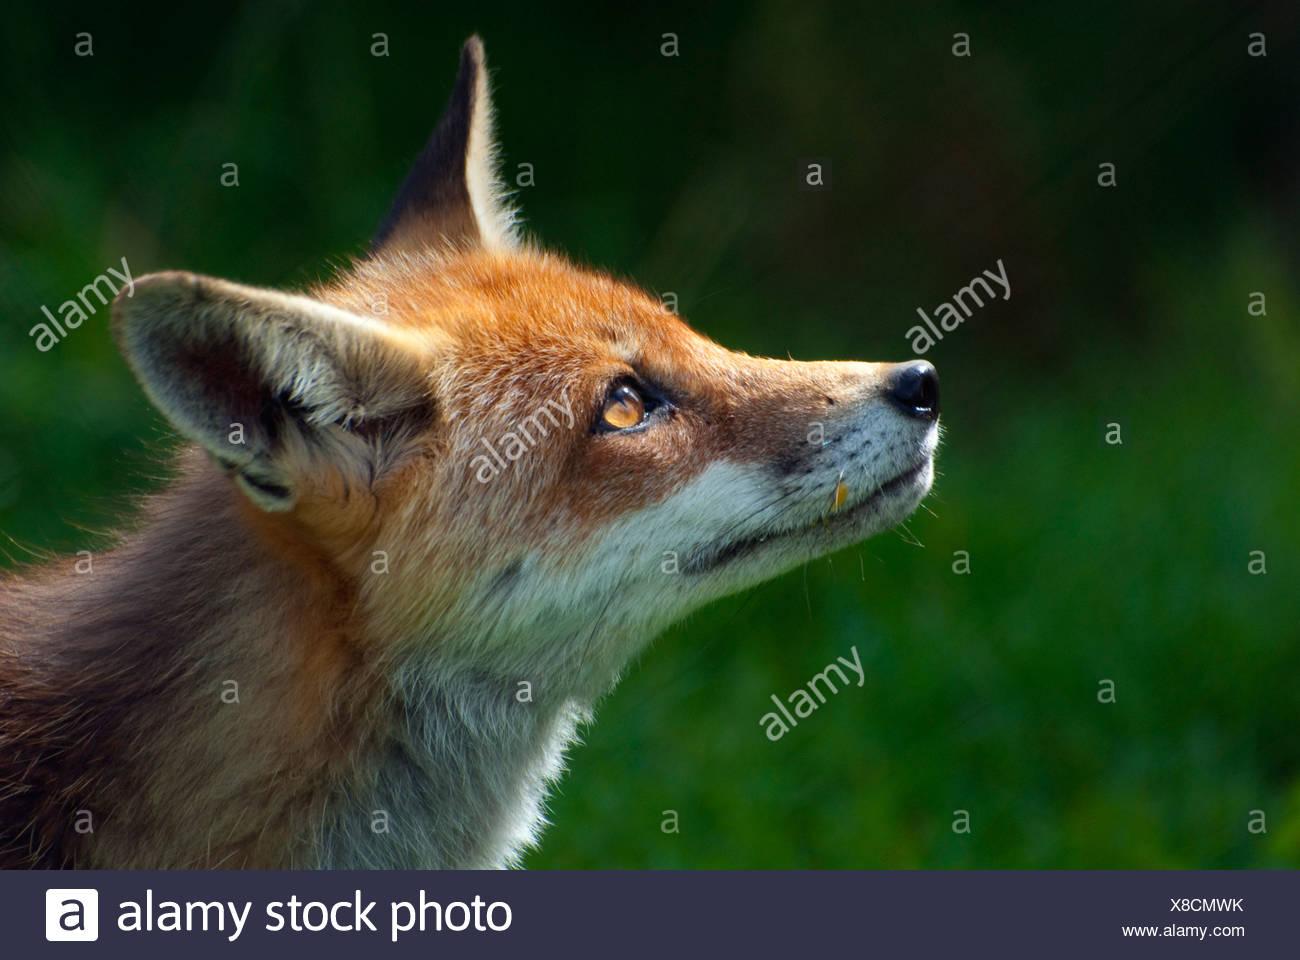 Red Fox, British Wildlife Centre, UK (captive) - Stock Image